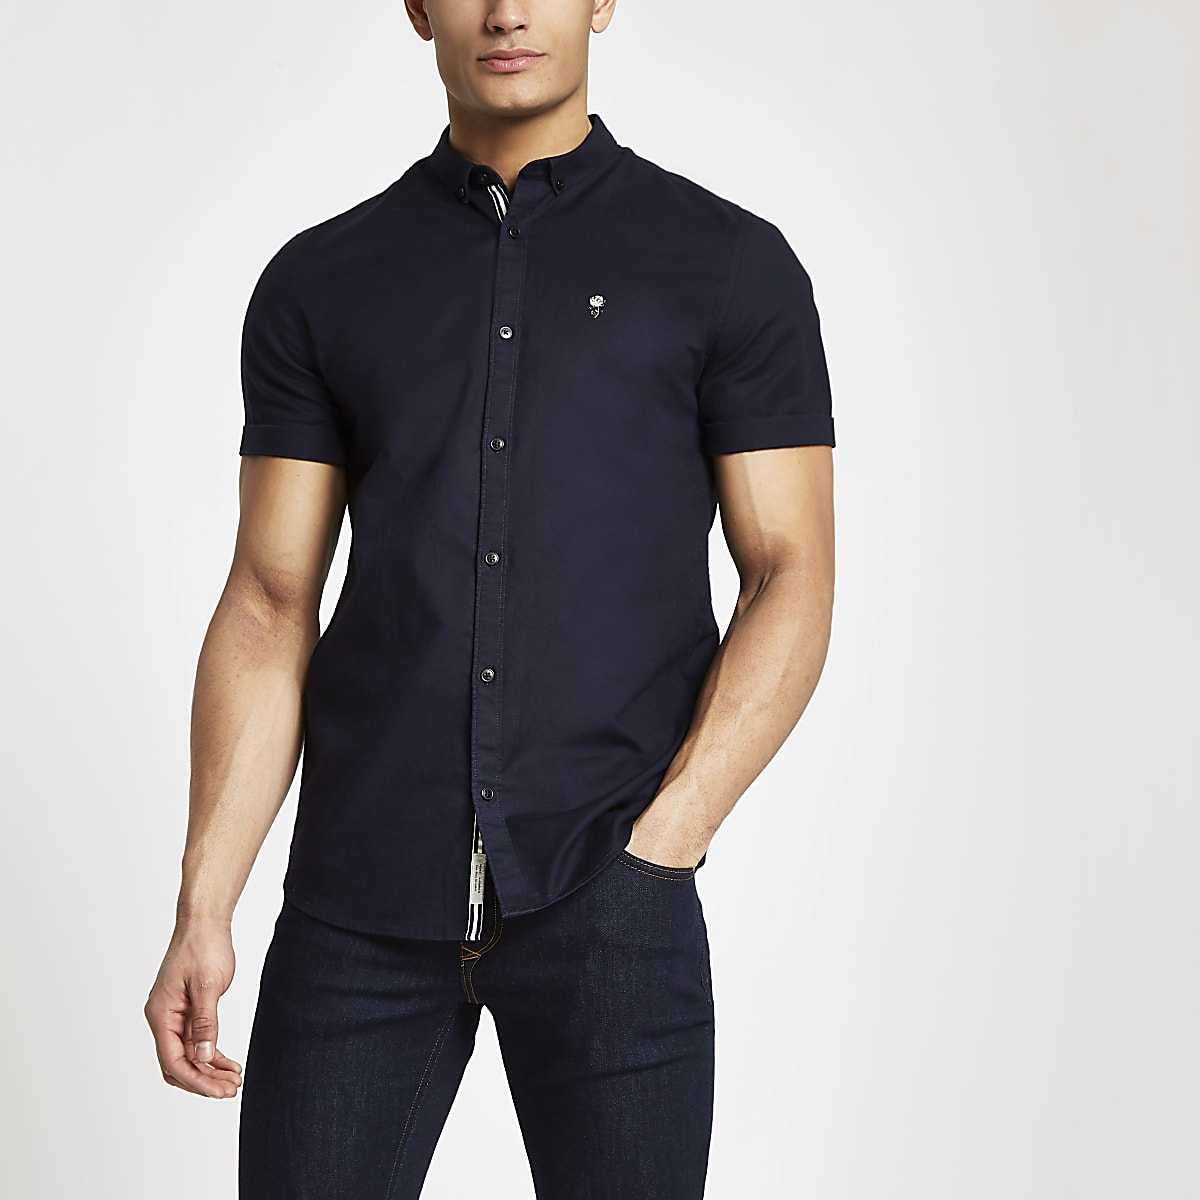 Marineblauw oxford overhemd met korte mouwen